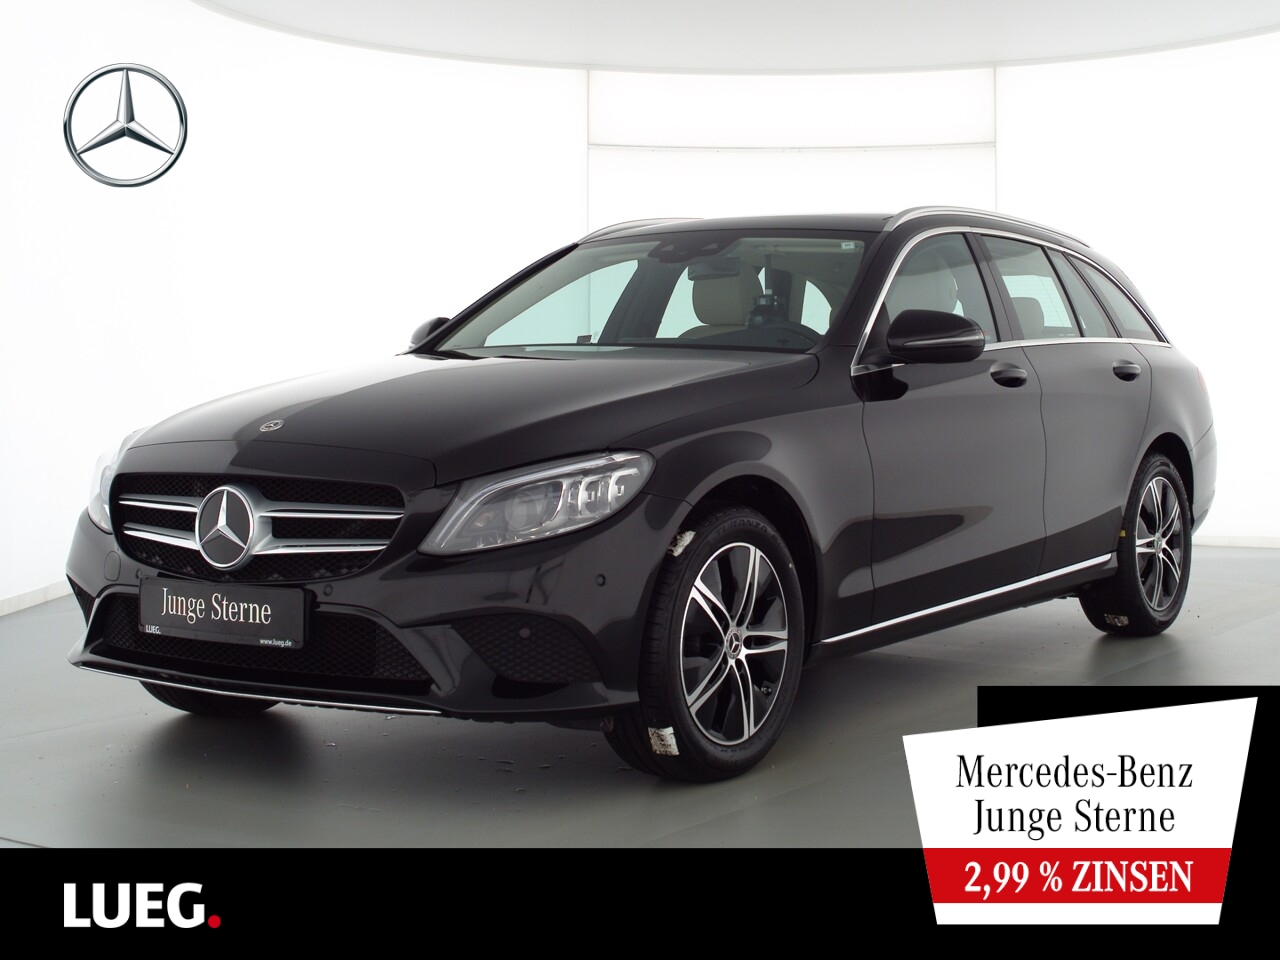 Mercedes-Benz C 180 T Avantgarde+Navi+Pano+Mbeam+AHK+SpurP+RFK, Jahr 2020, Benzin